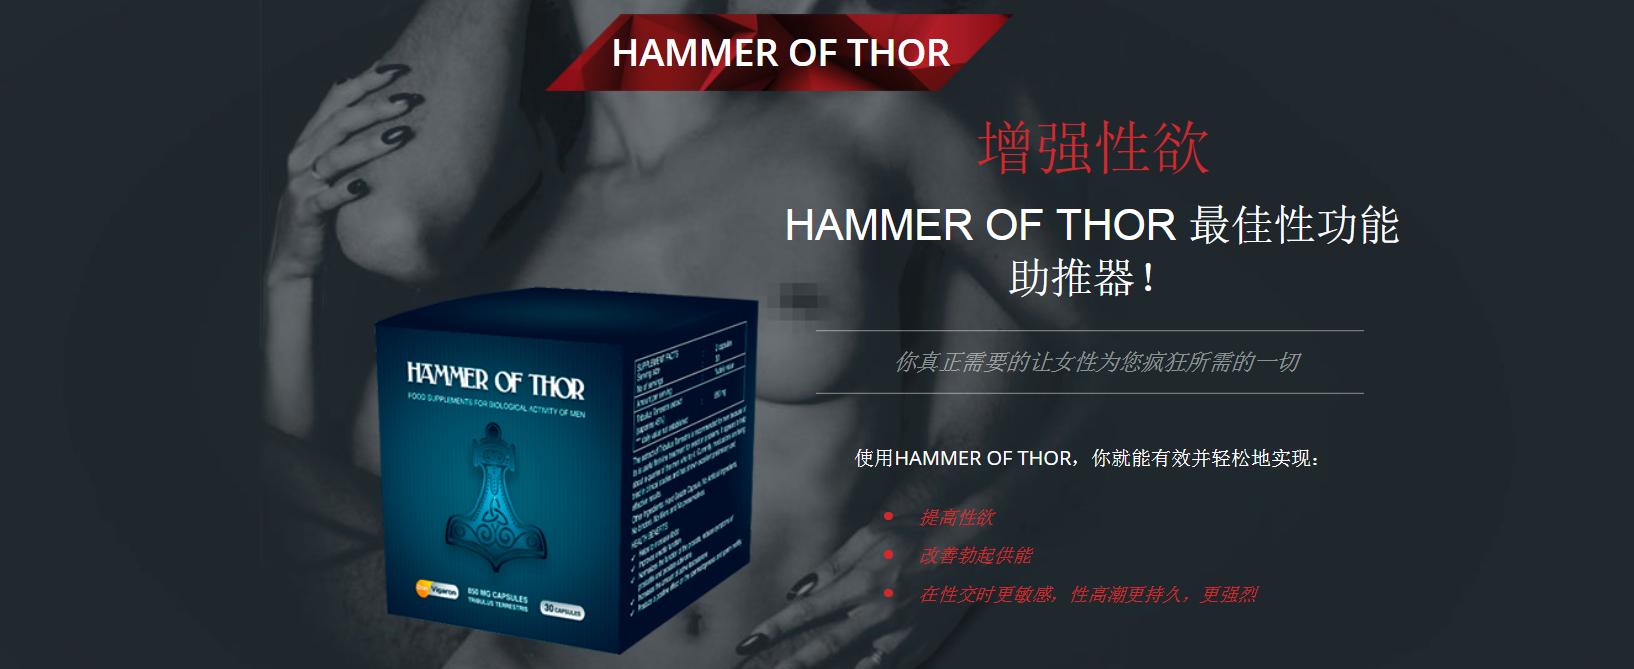 hammer of thor izon klinikobatindonesia com agen resmi vimax